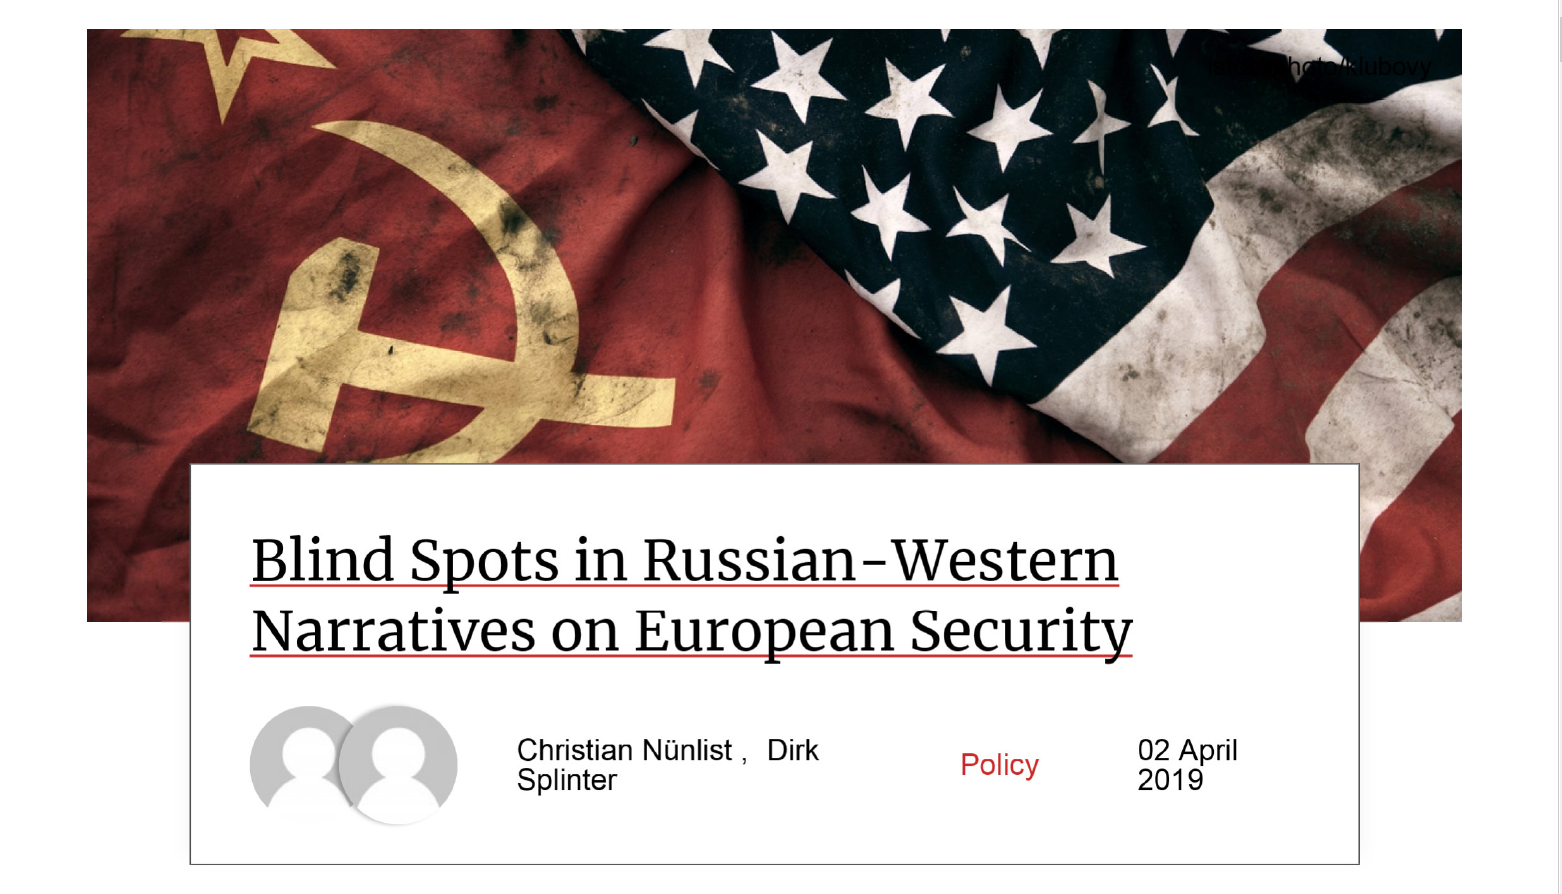 Blind spots in Russian-Western narratives on European security